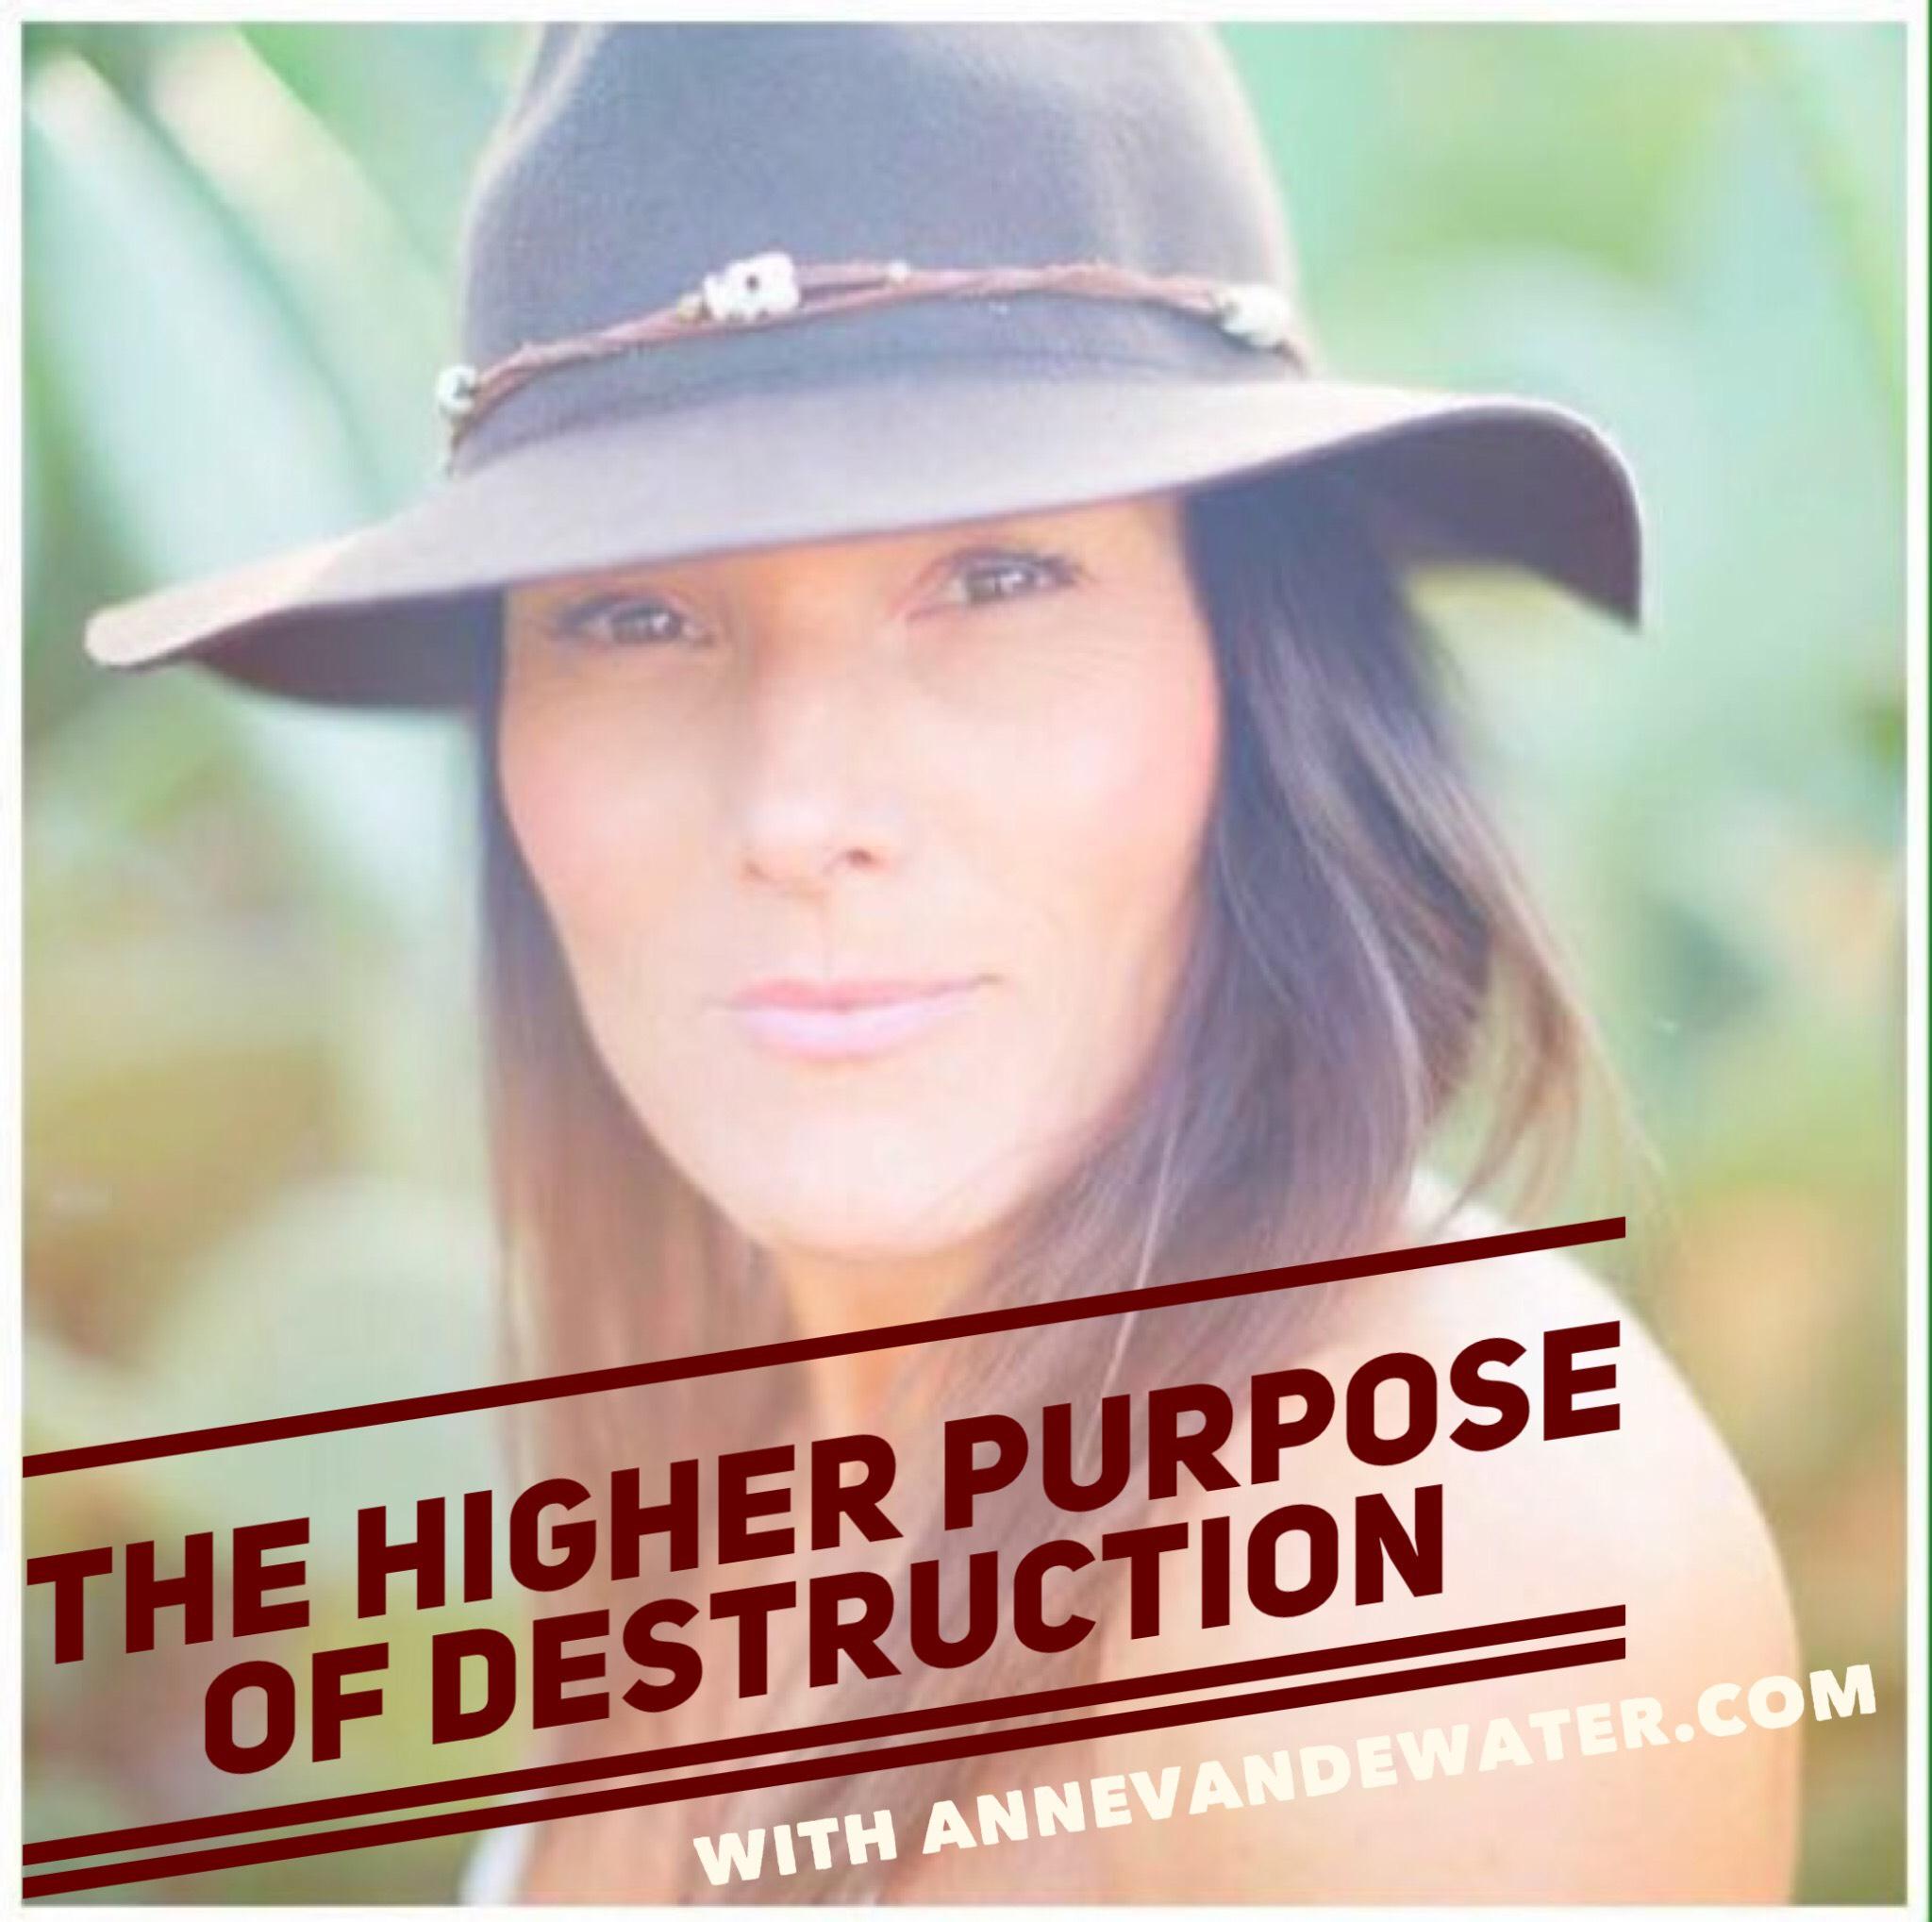 THE HIGHER PURPOSE OF DESTRUCTION